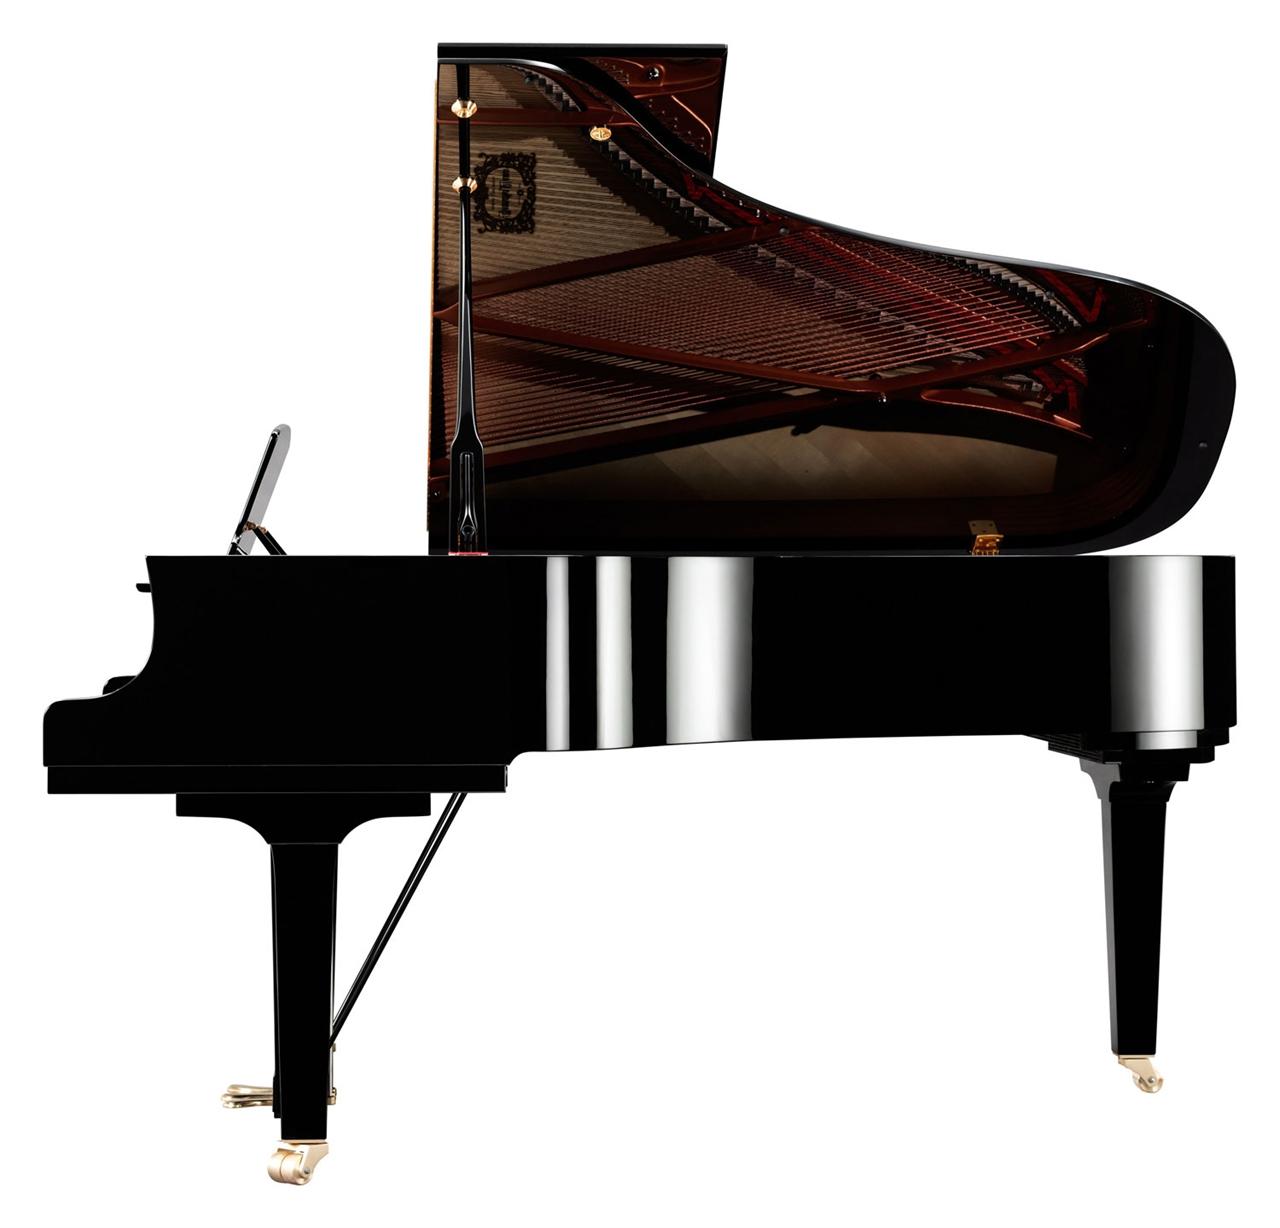 Yamaha C6x Concert Grand Polished Ebony Piano City